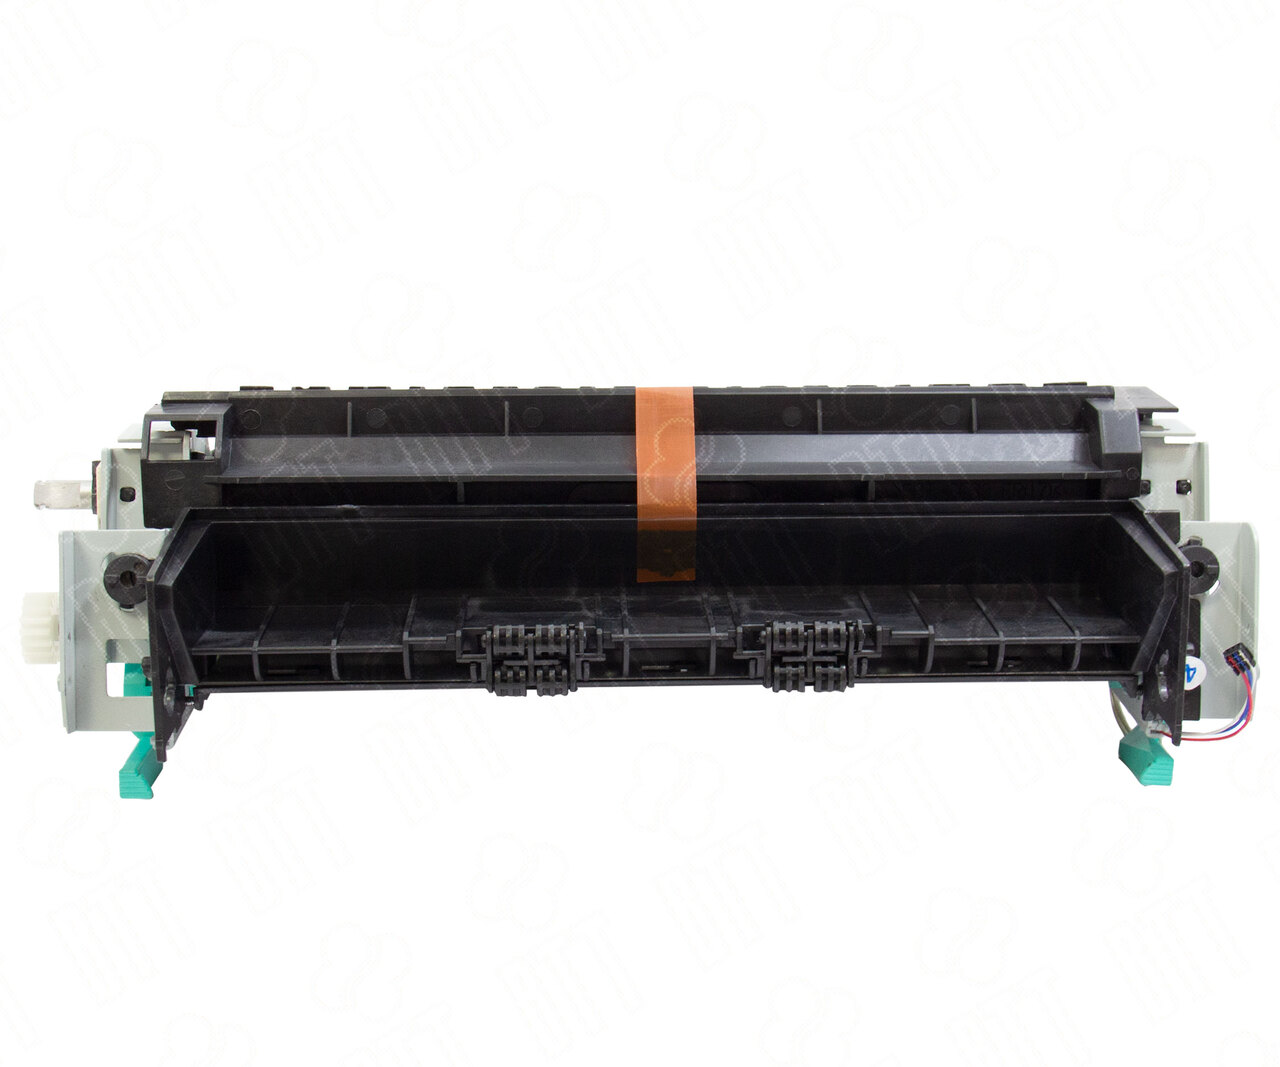 Термоузел (Печь) в сборе совм. для HP LJ P2015/P2014/M2727